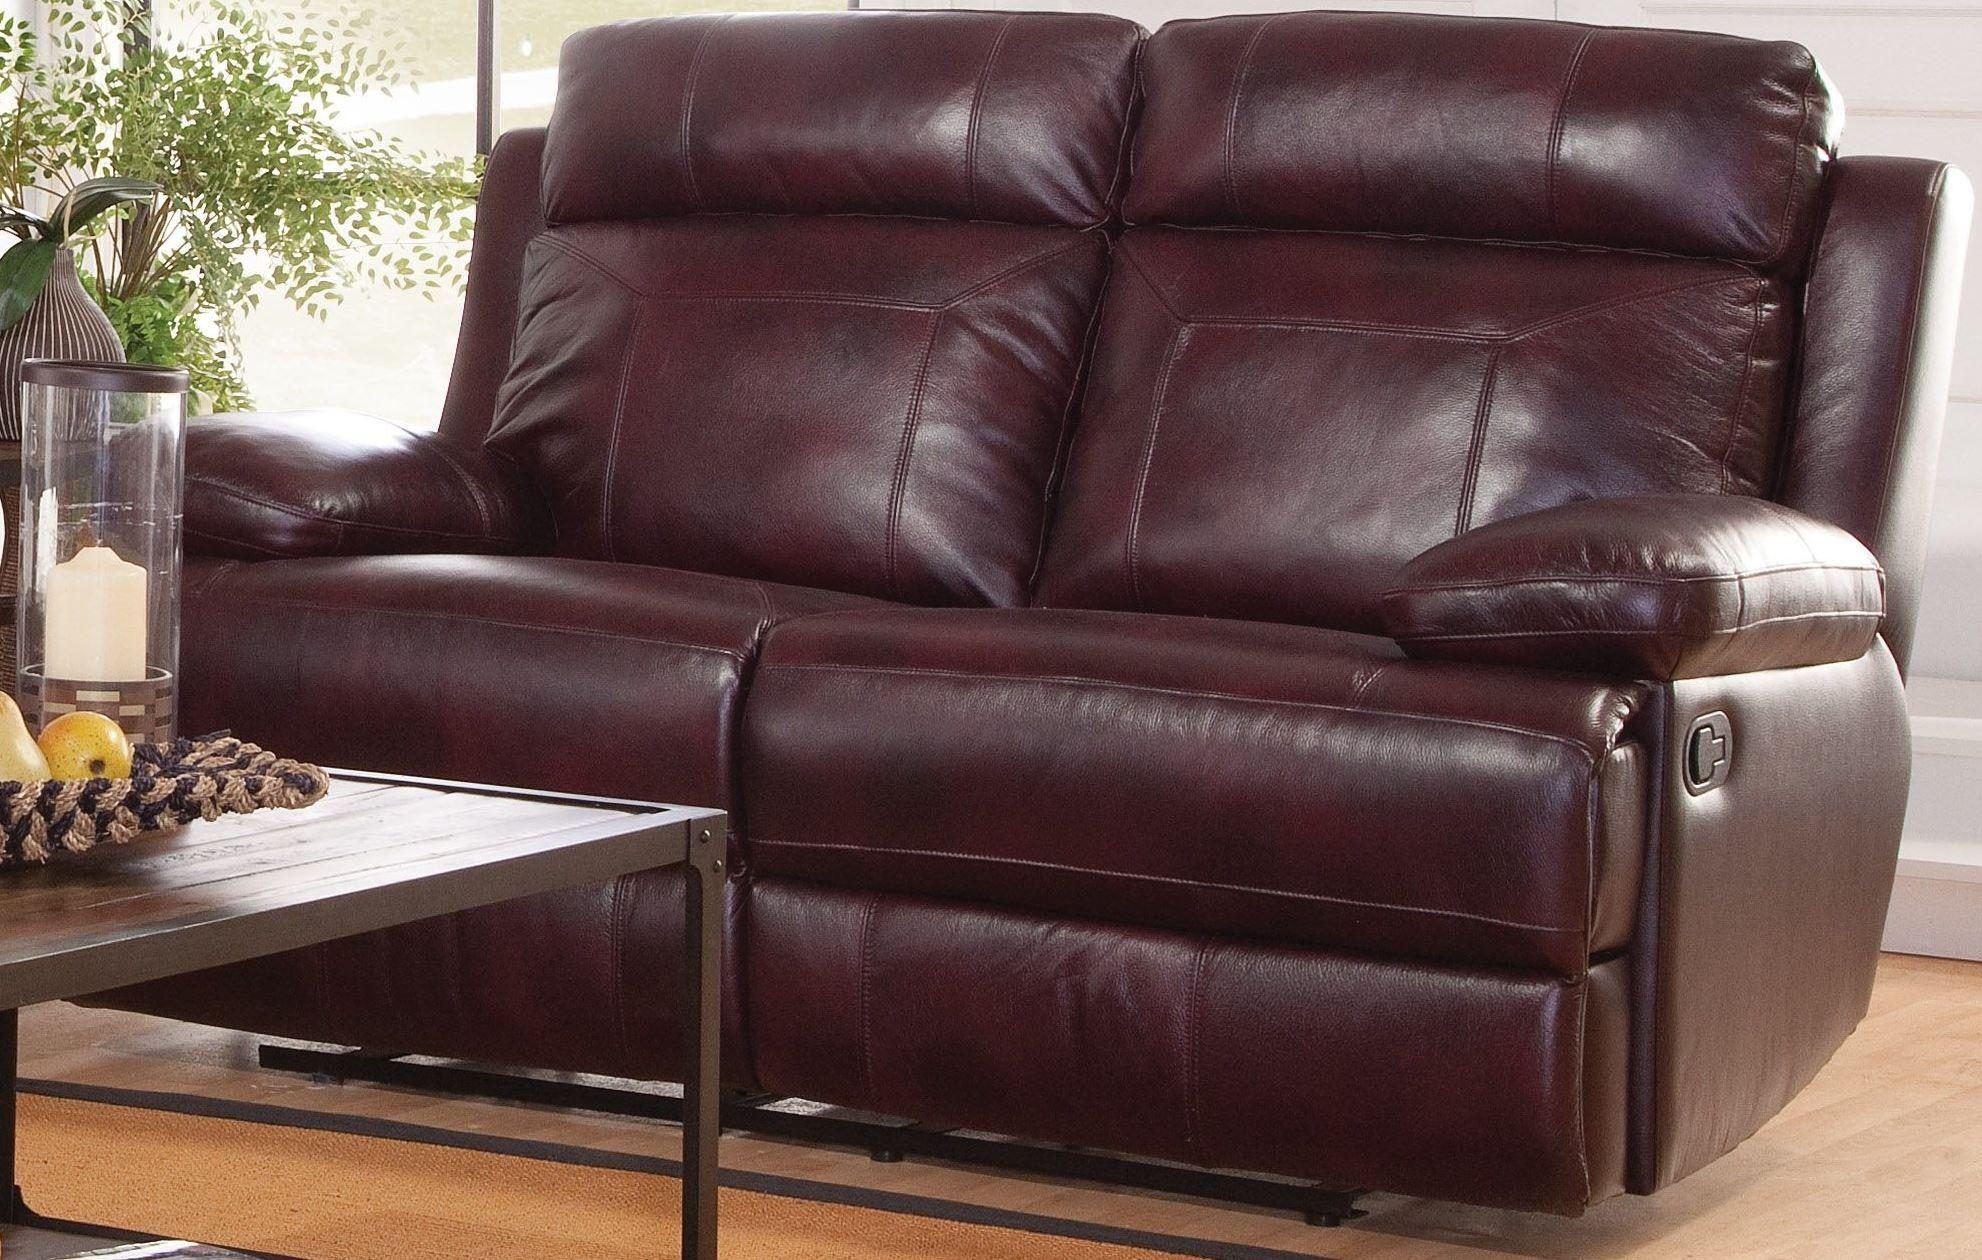 burgundy sofa and loveseat wooden set designs in delhi mansfield reclining l6807 20 bbr new